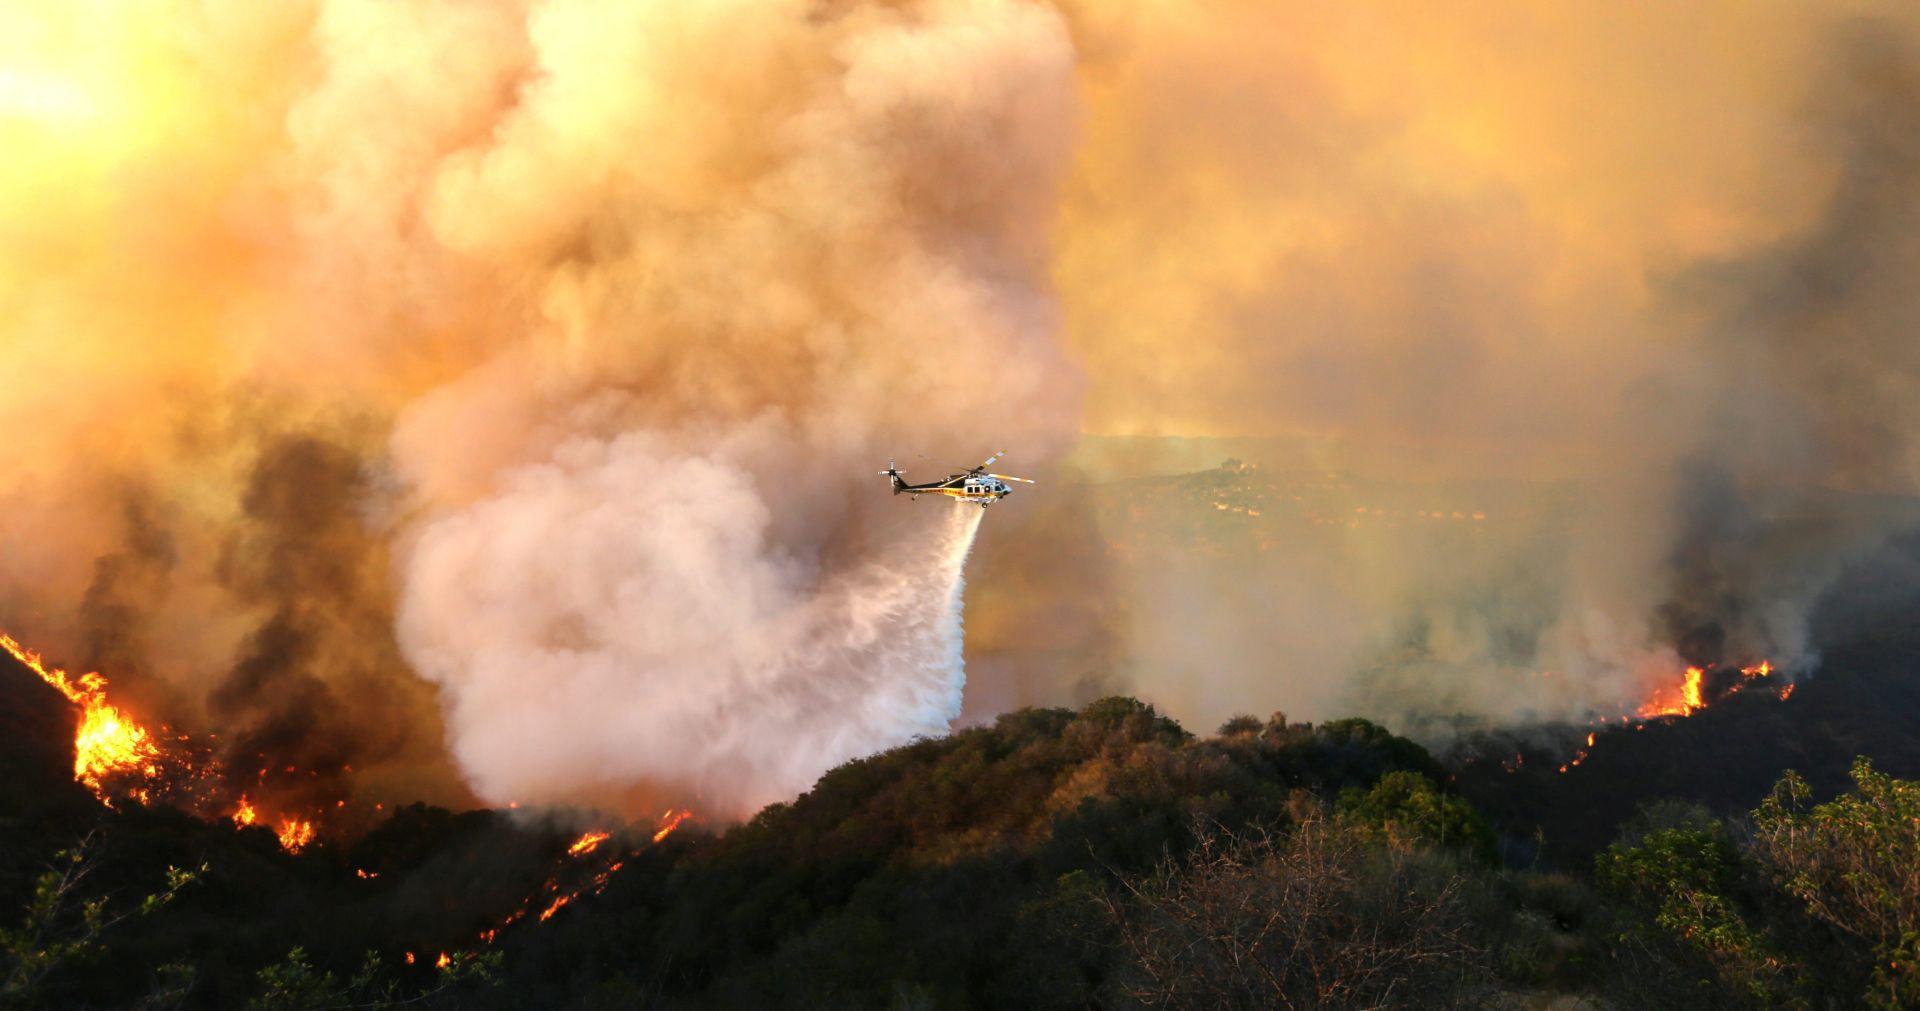 Požari nadomak Los Angelesa, evakuirano 5000 ljudi